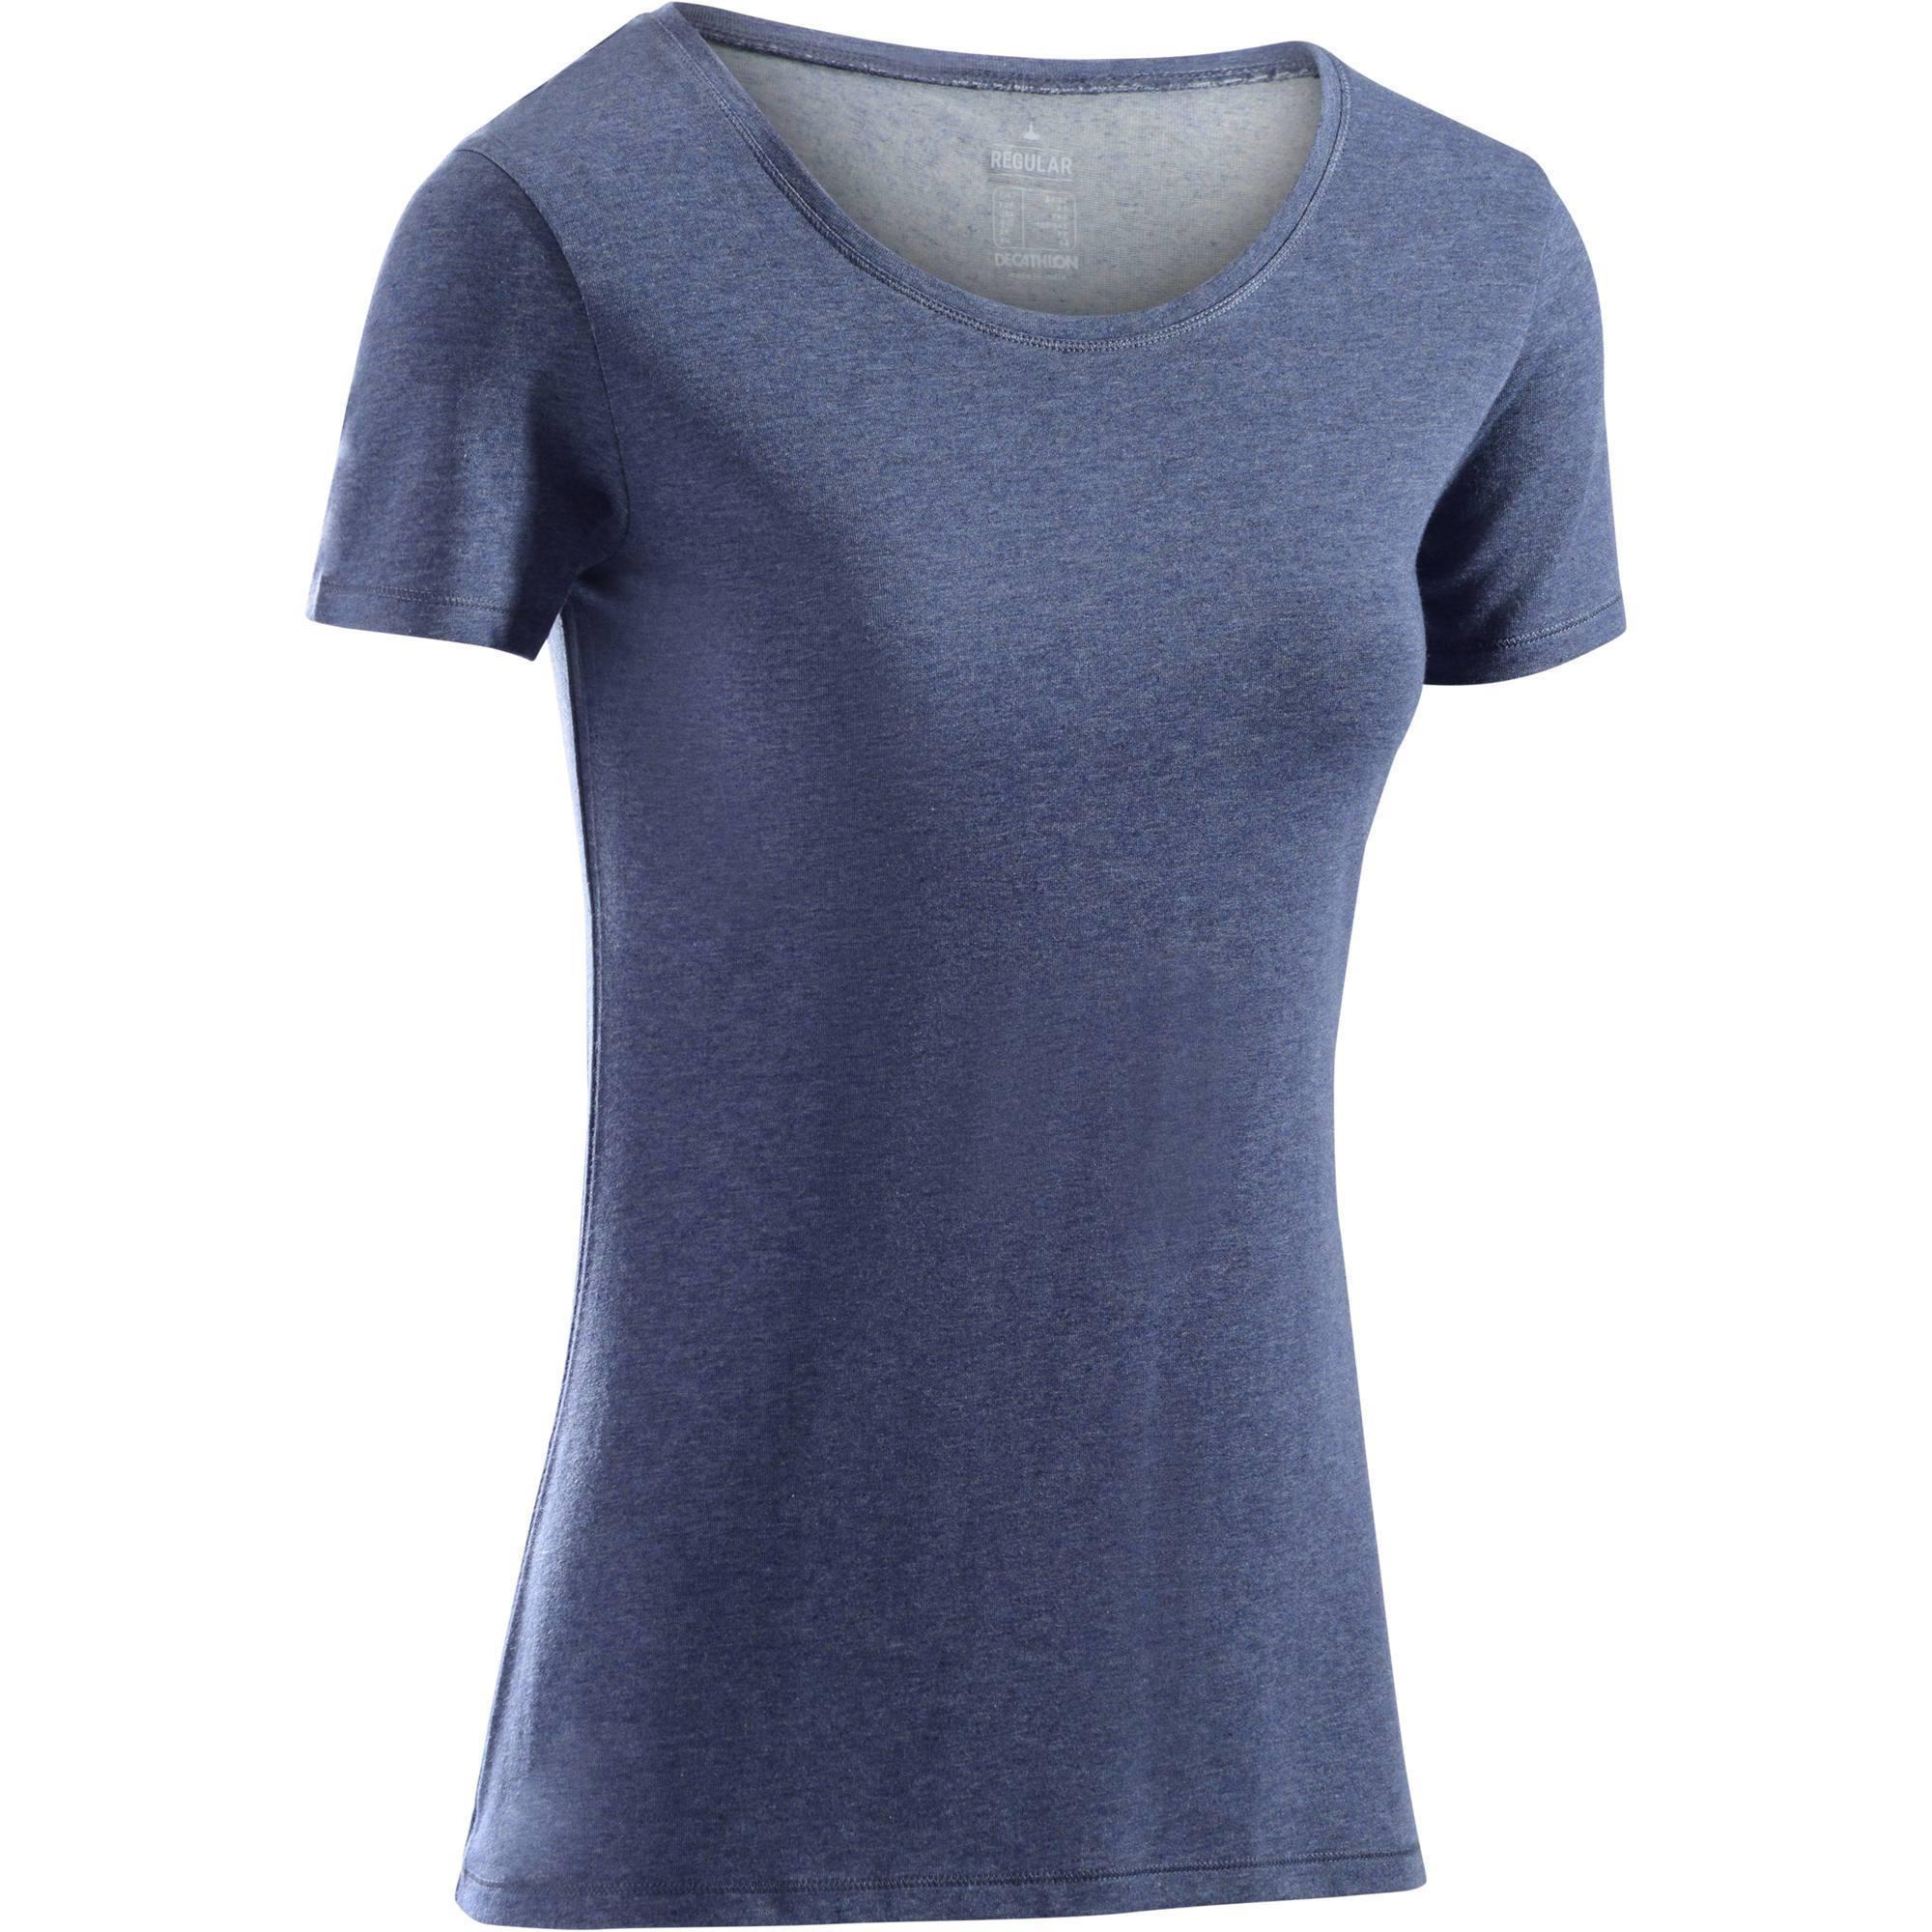 T-Shirt 500 régular manches courtes Gym   Pilates femme bleu chiné foncé 41f3b198764